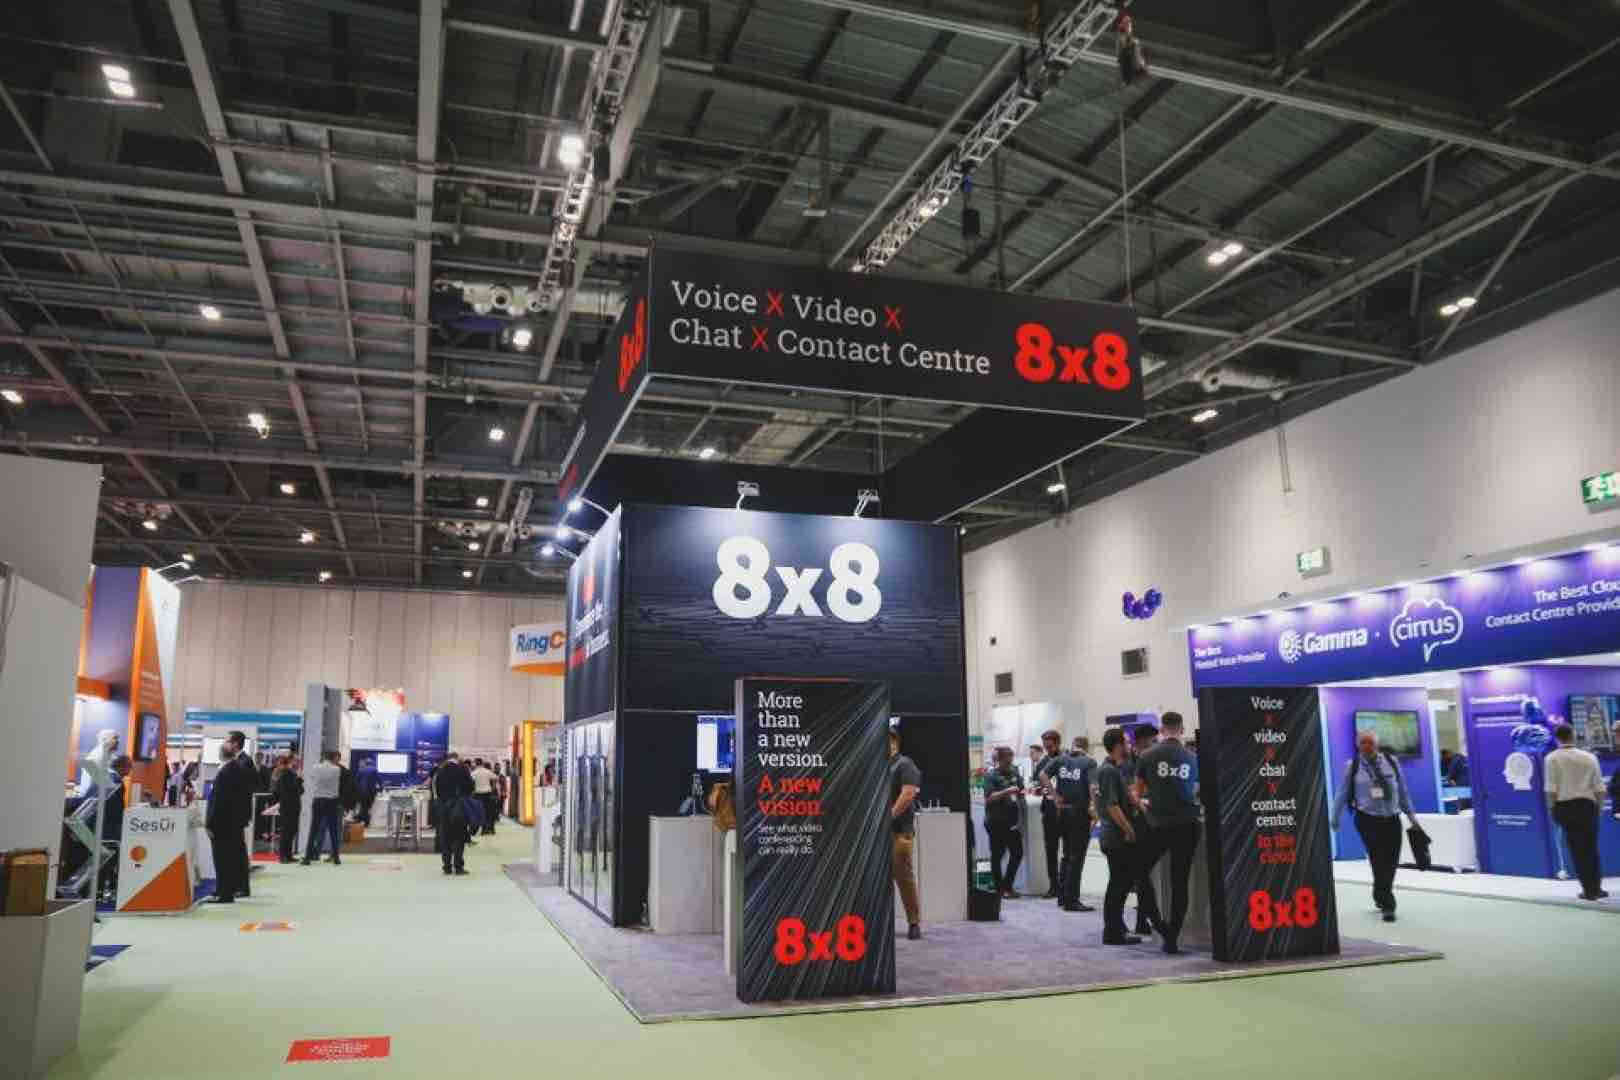 075 Exhibition Stands London.jpg